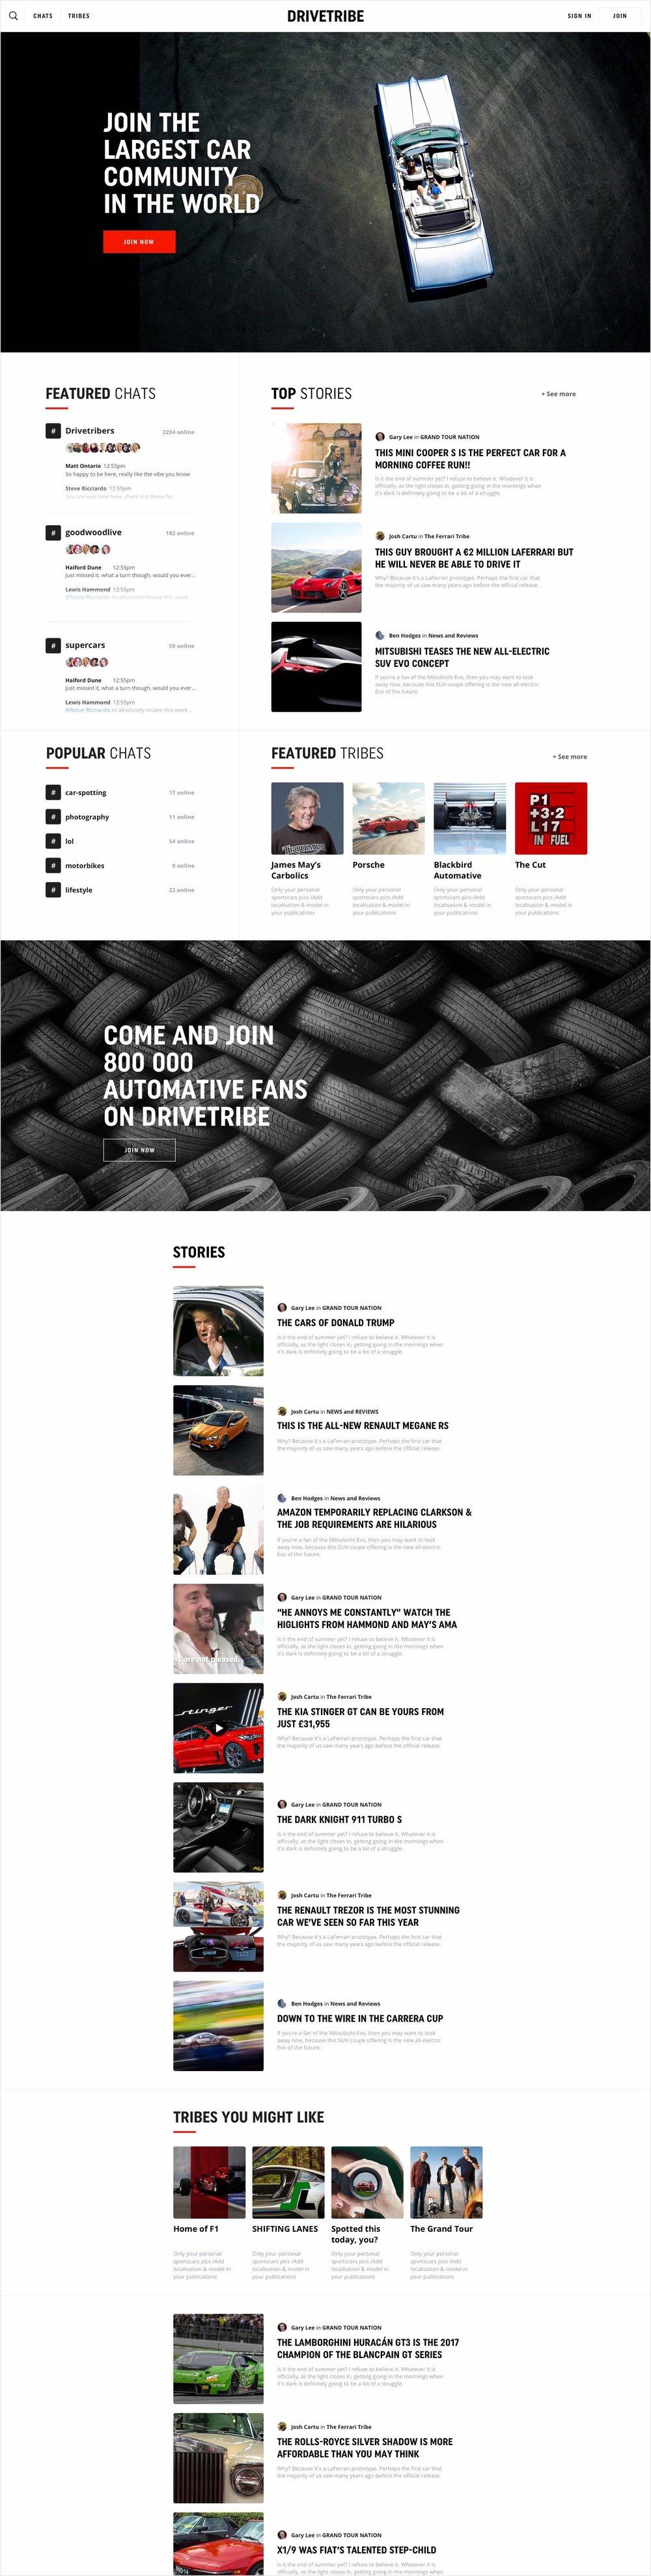 drivetribe - homepage